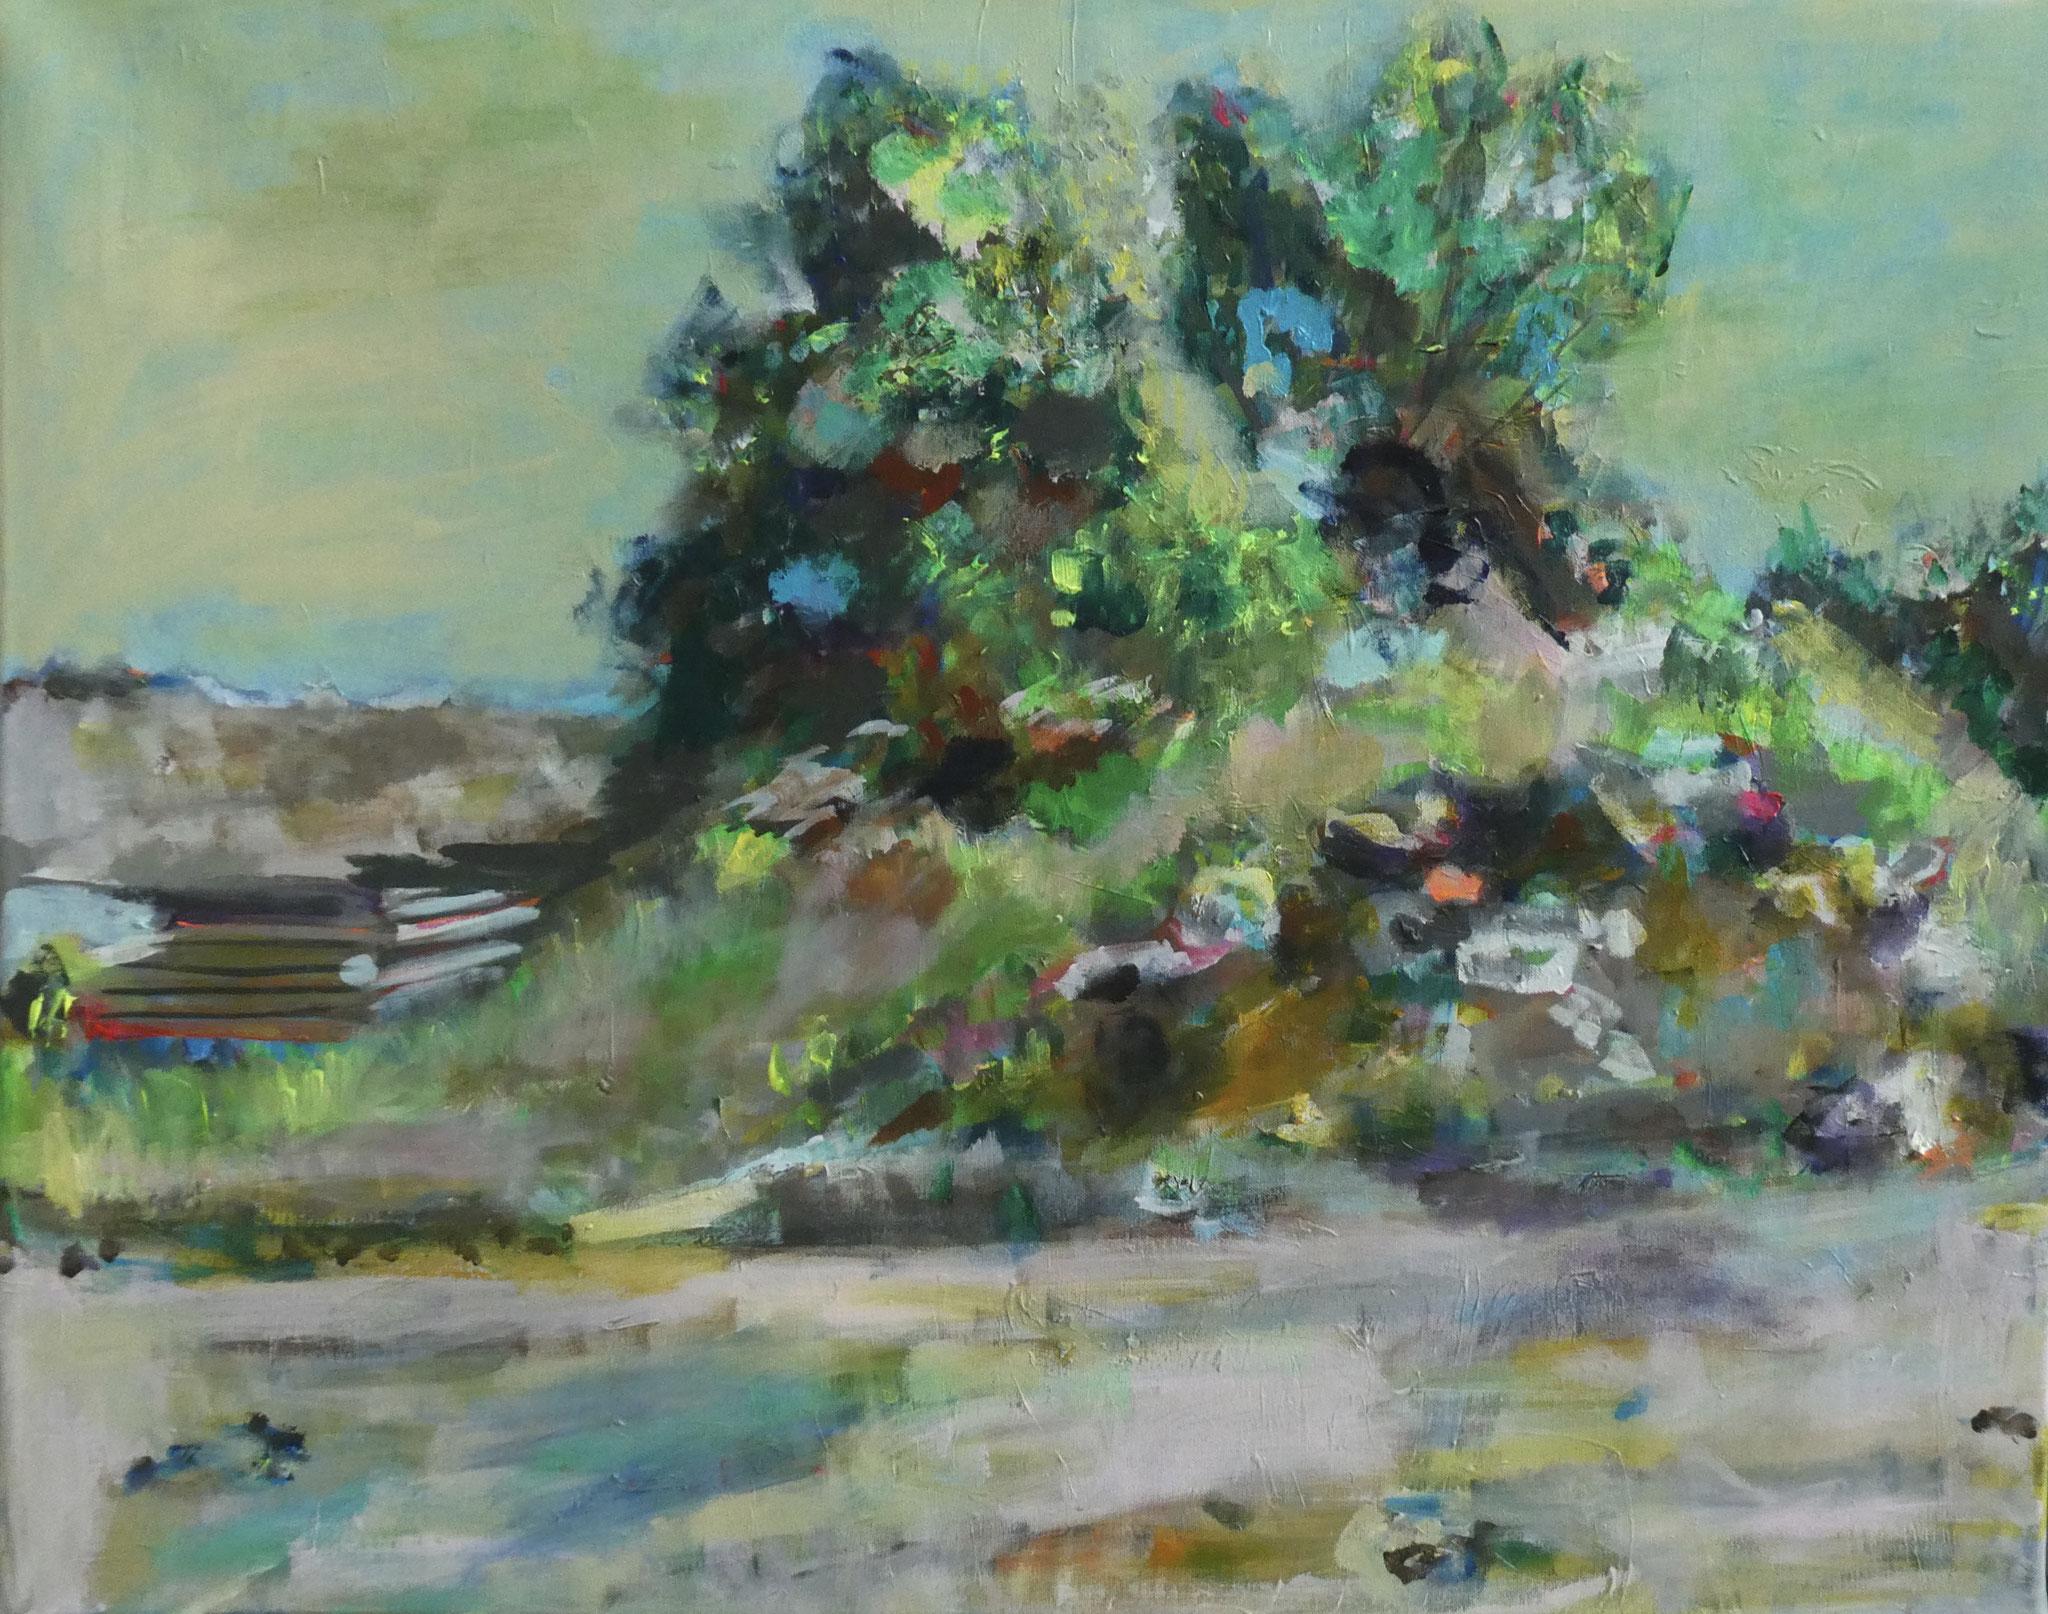 Steine 2, 100x120, acrylic on canvas